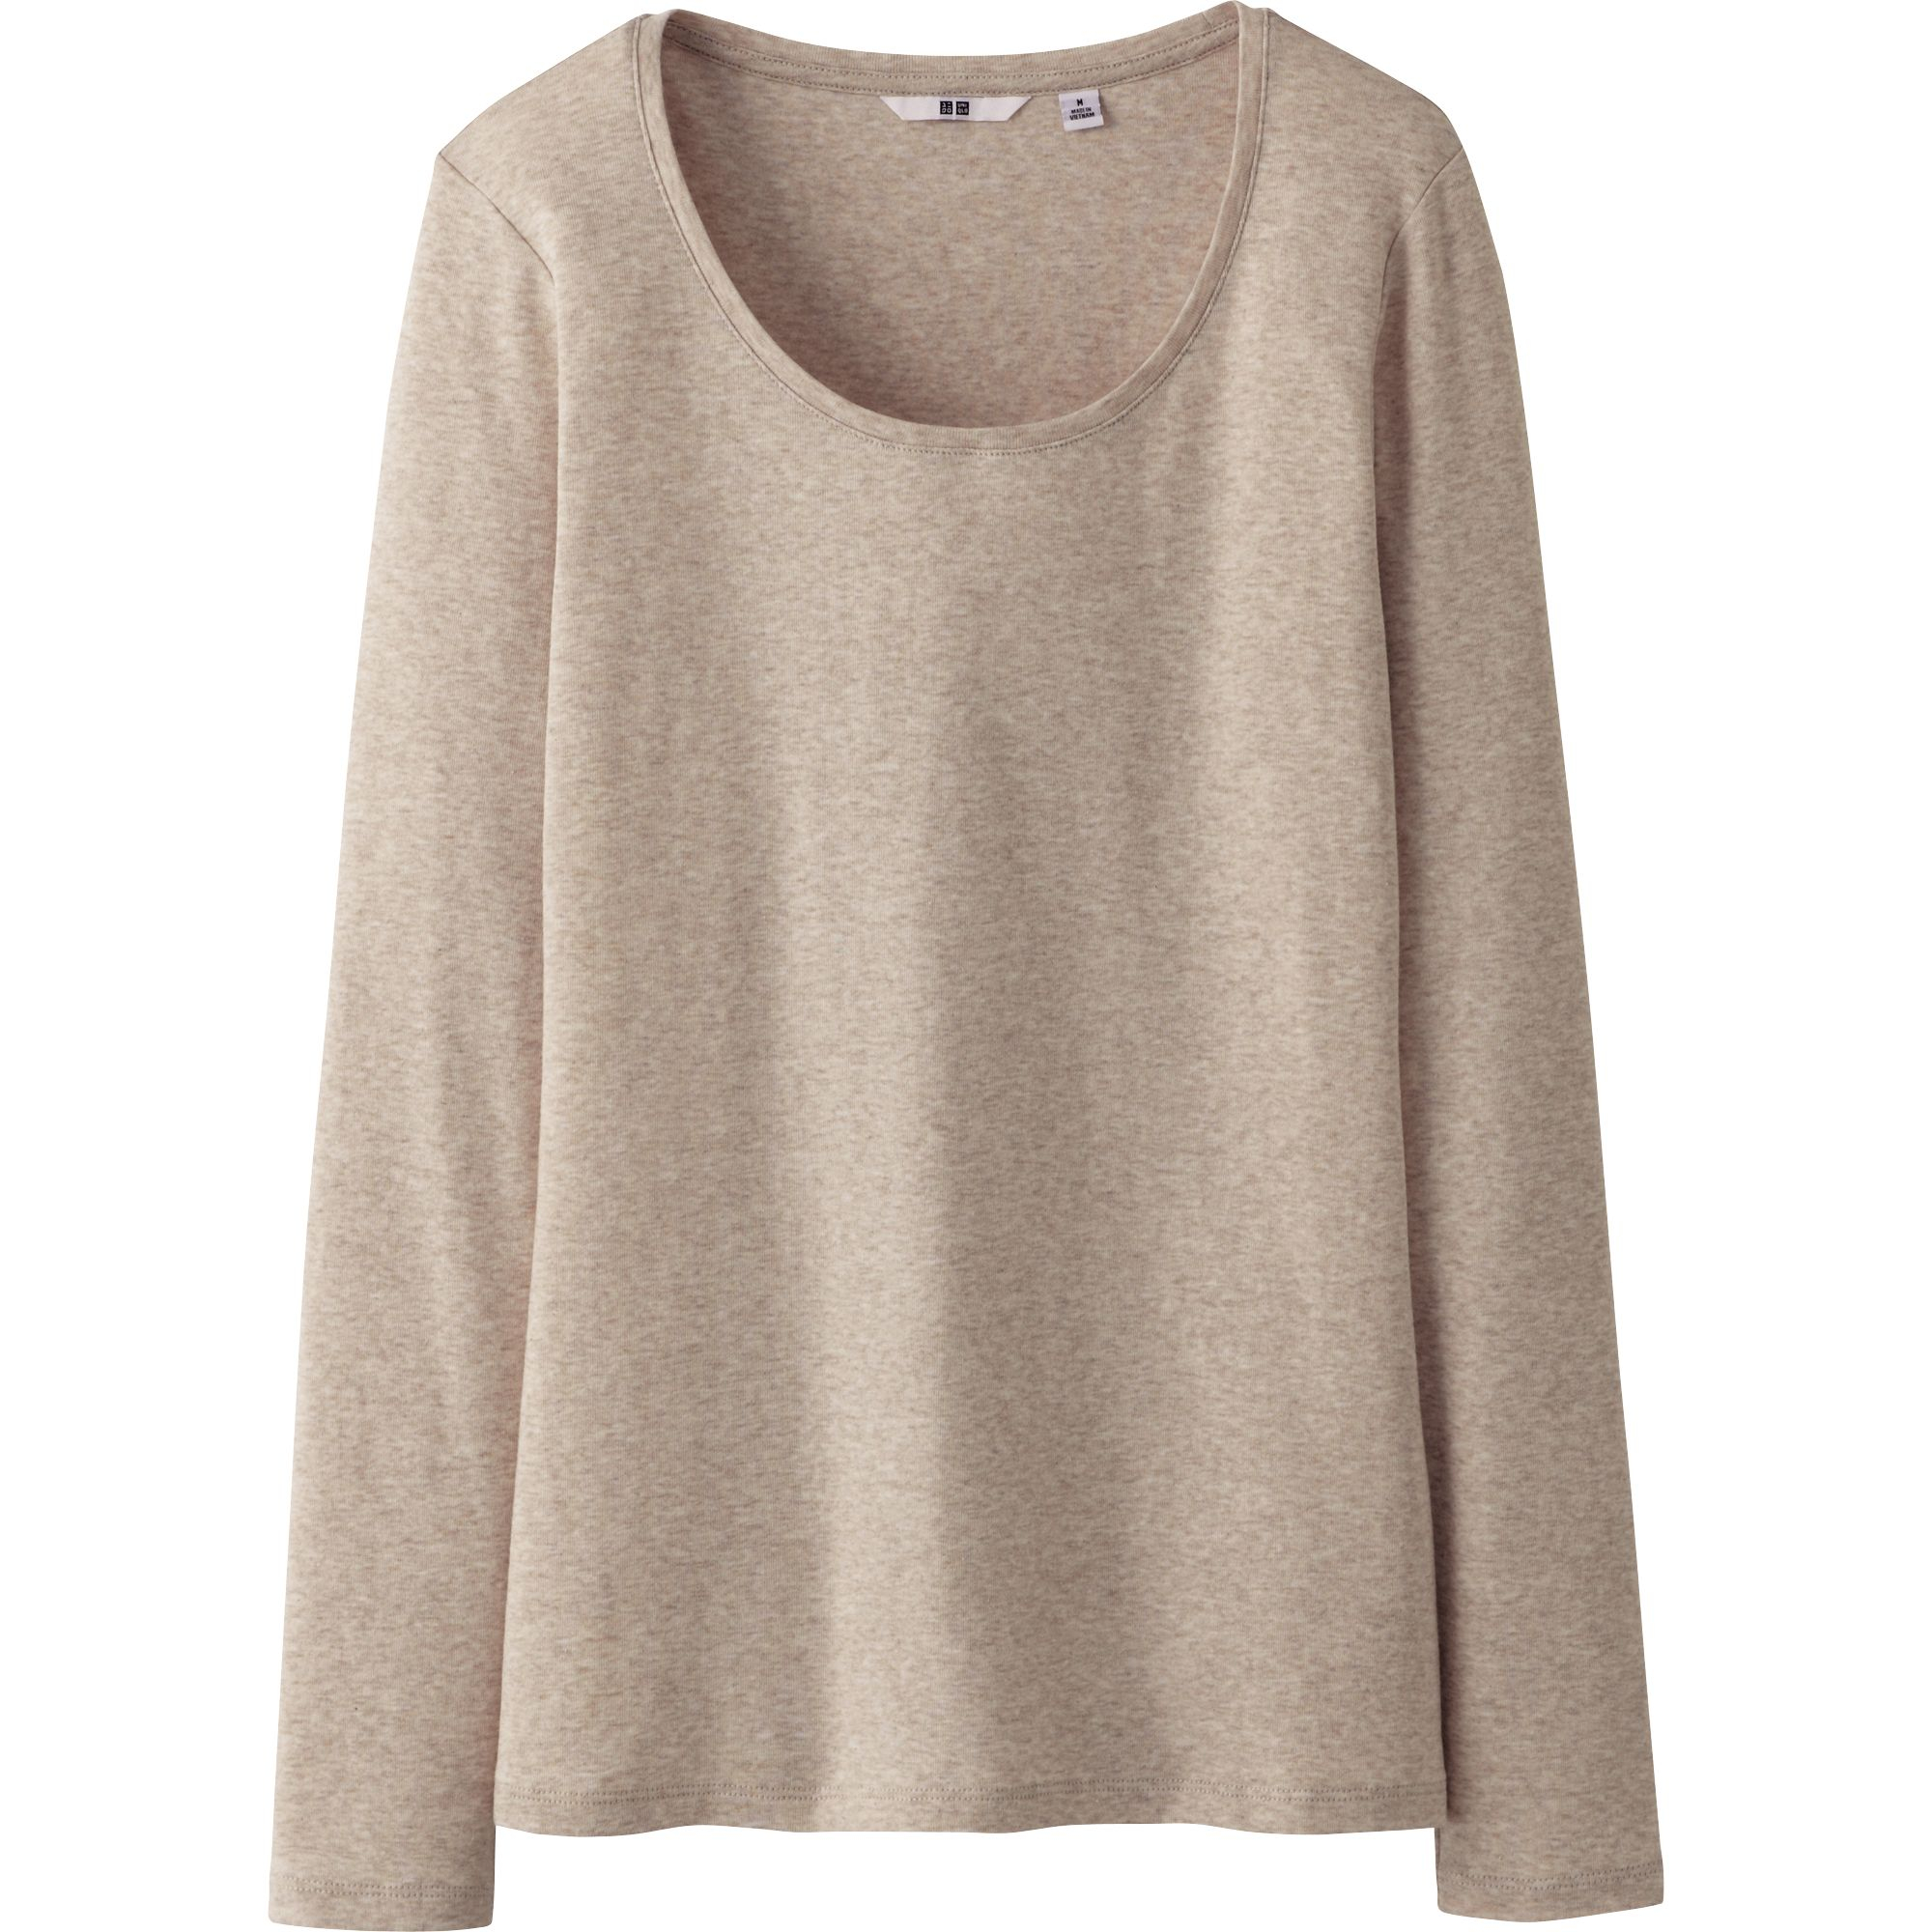 Uniqlo premium cotton crew neck long sleeve tshirt b in for Uniqlo premium t shirt